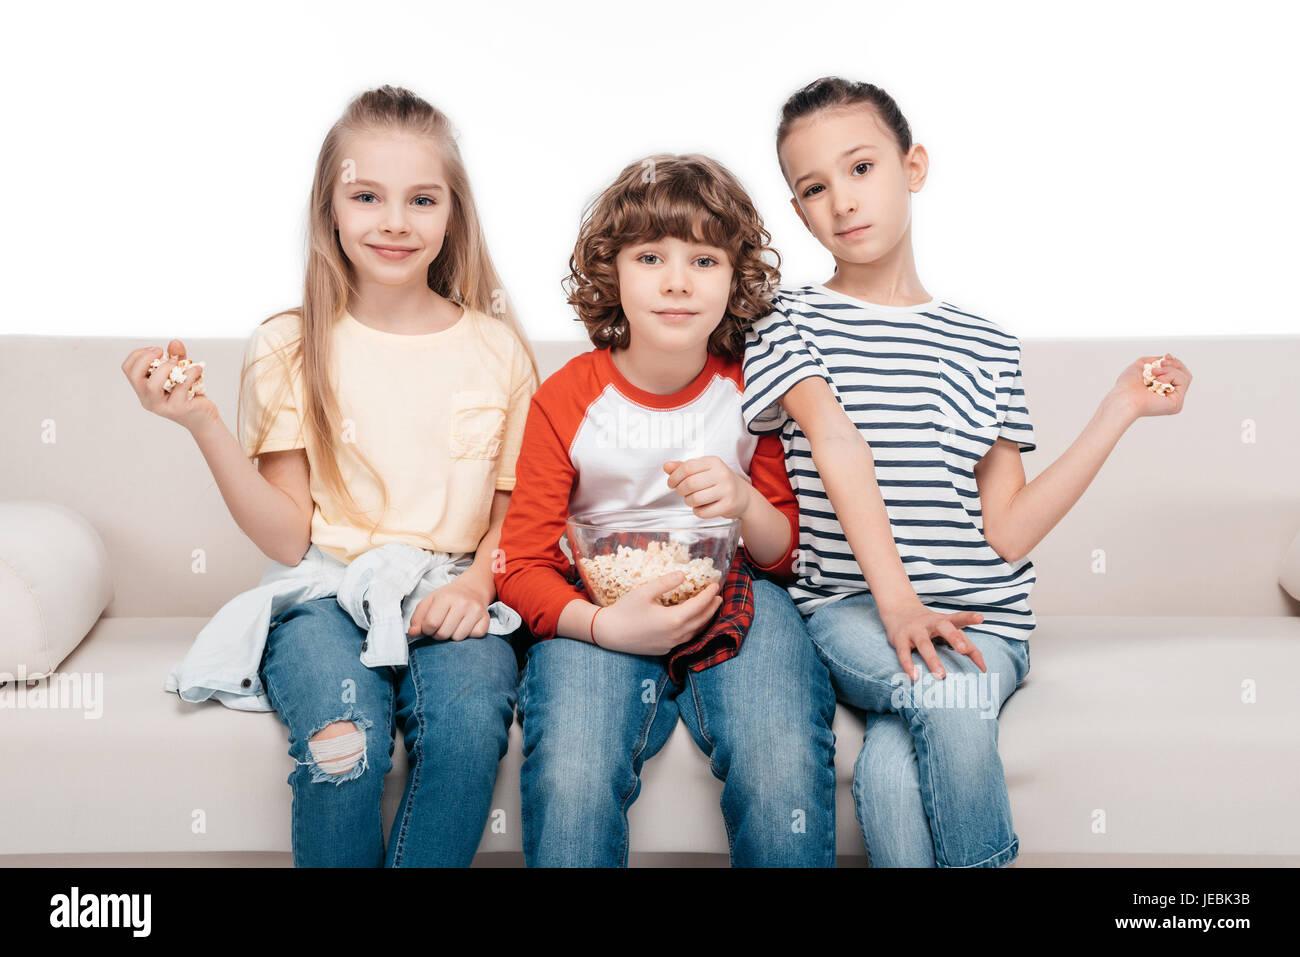 Alegre amigos sentado en sofá con palomitas de maíz Imagen De Stock